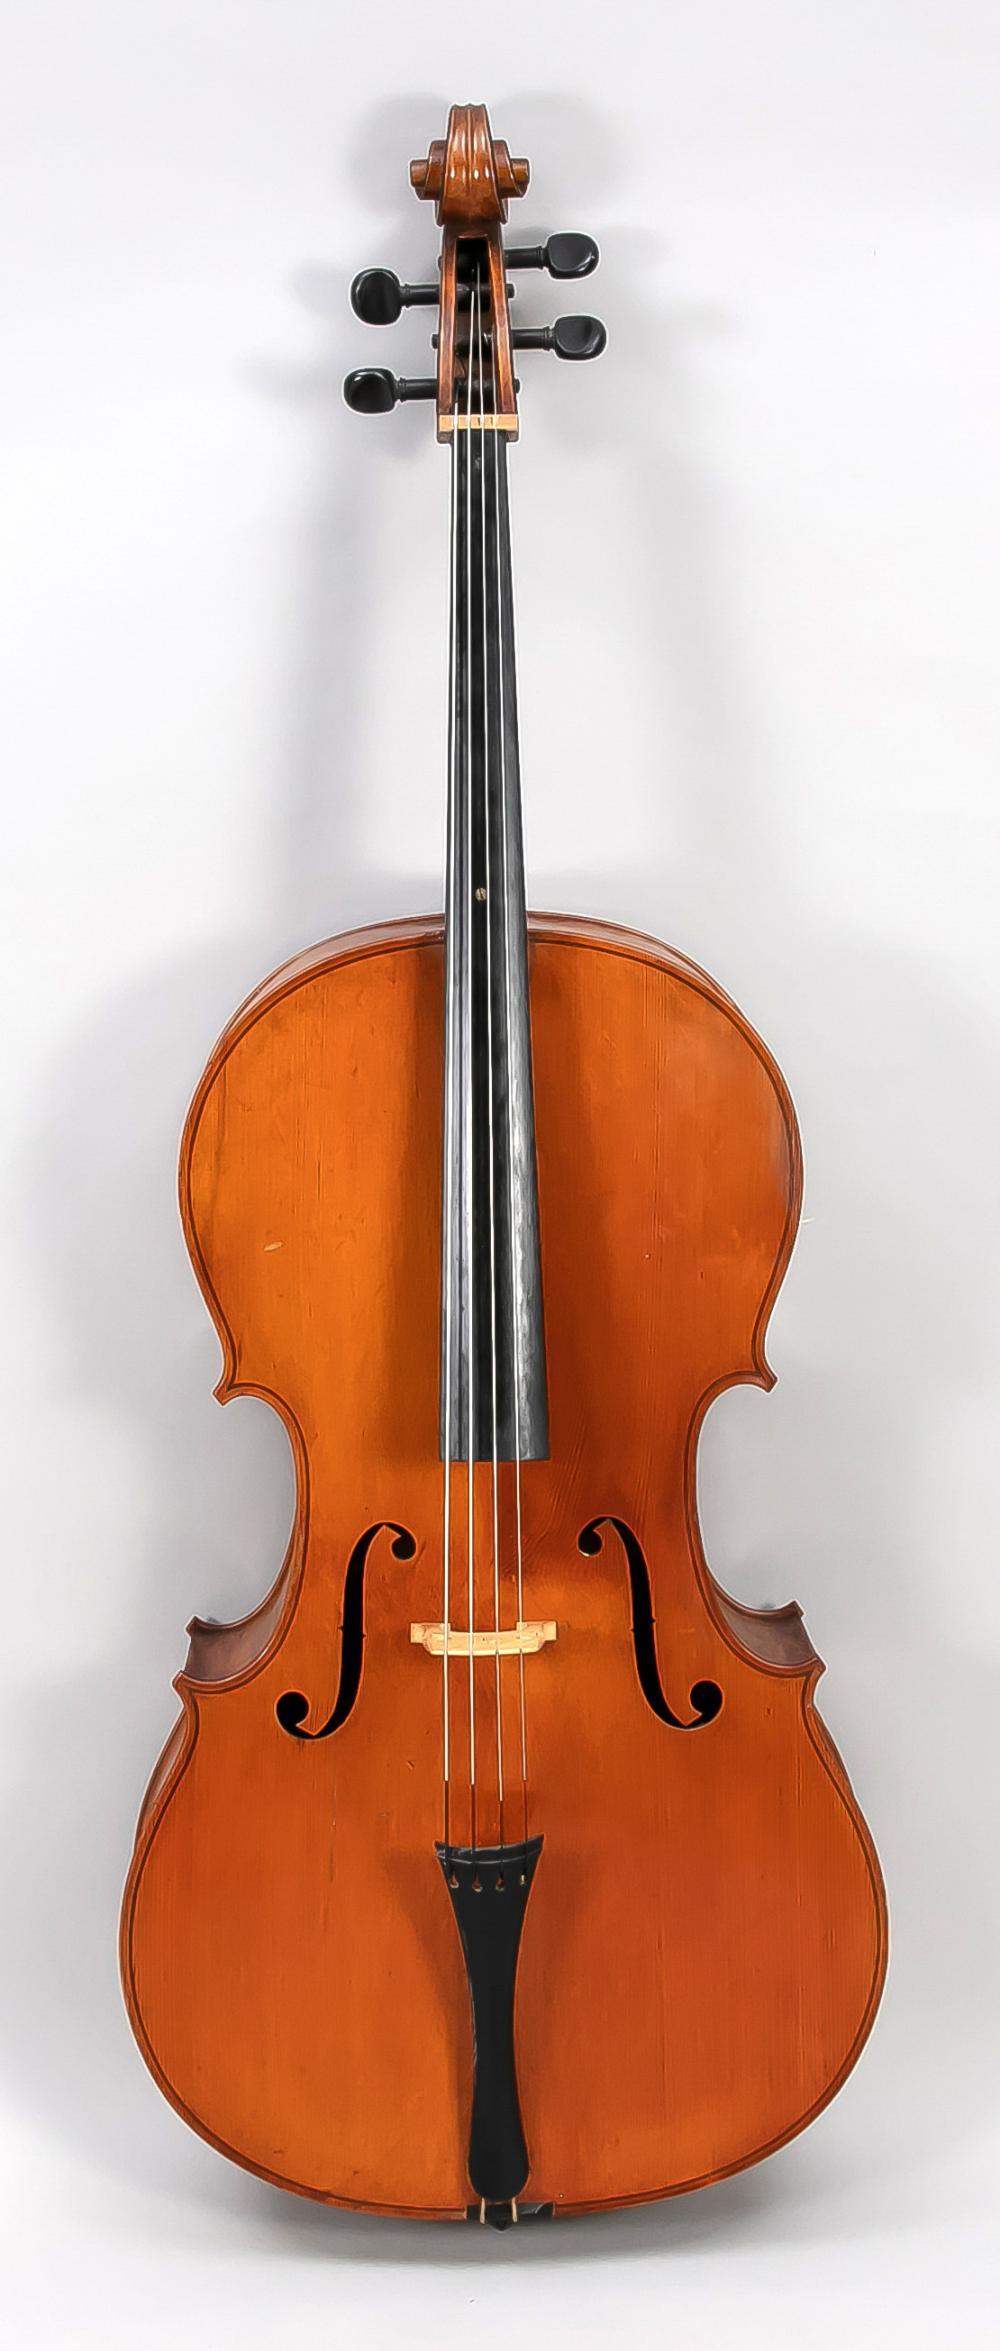 Cello, 20th century, with new str